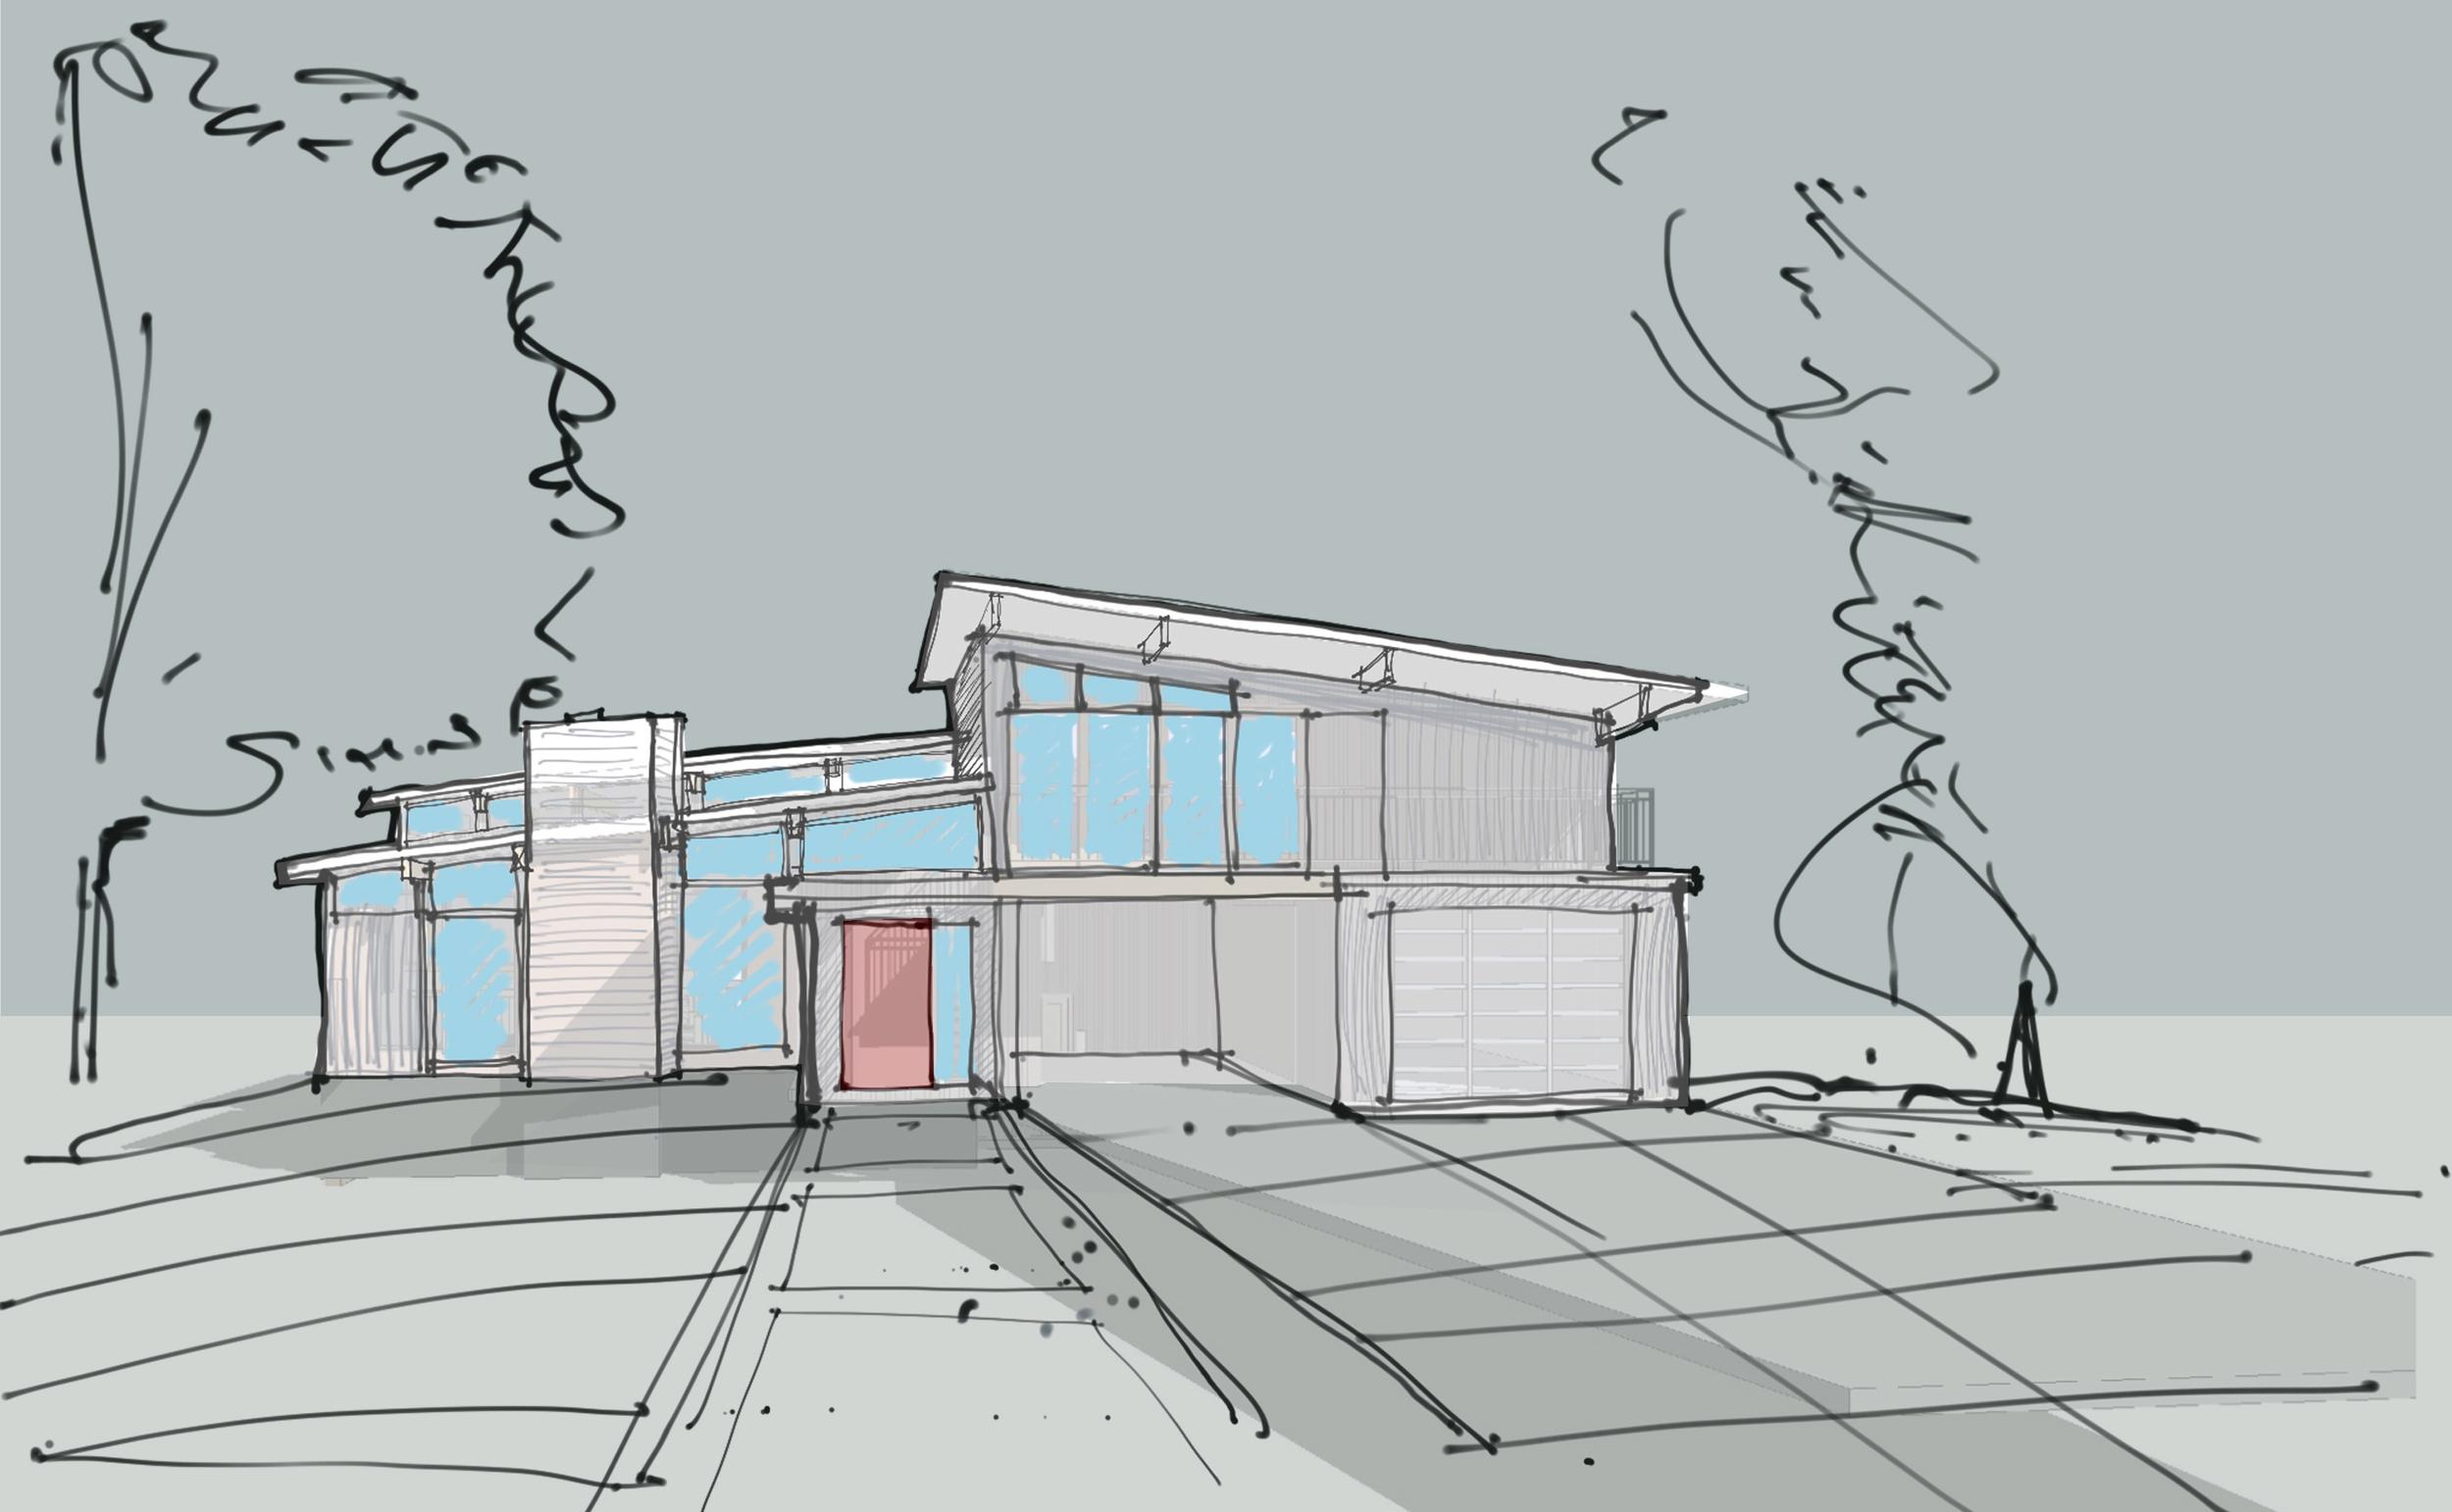 Grant - Perspective sketche - Side Shed Roof.jpg